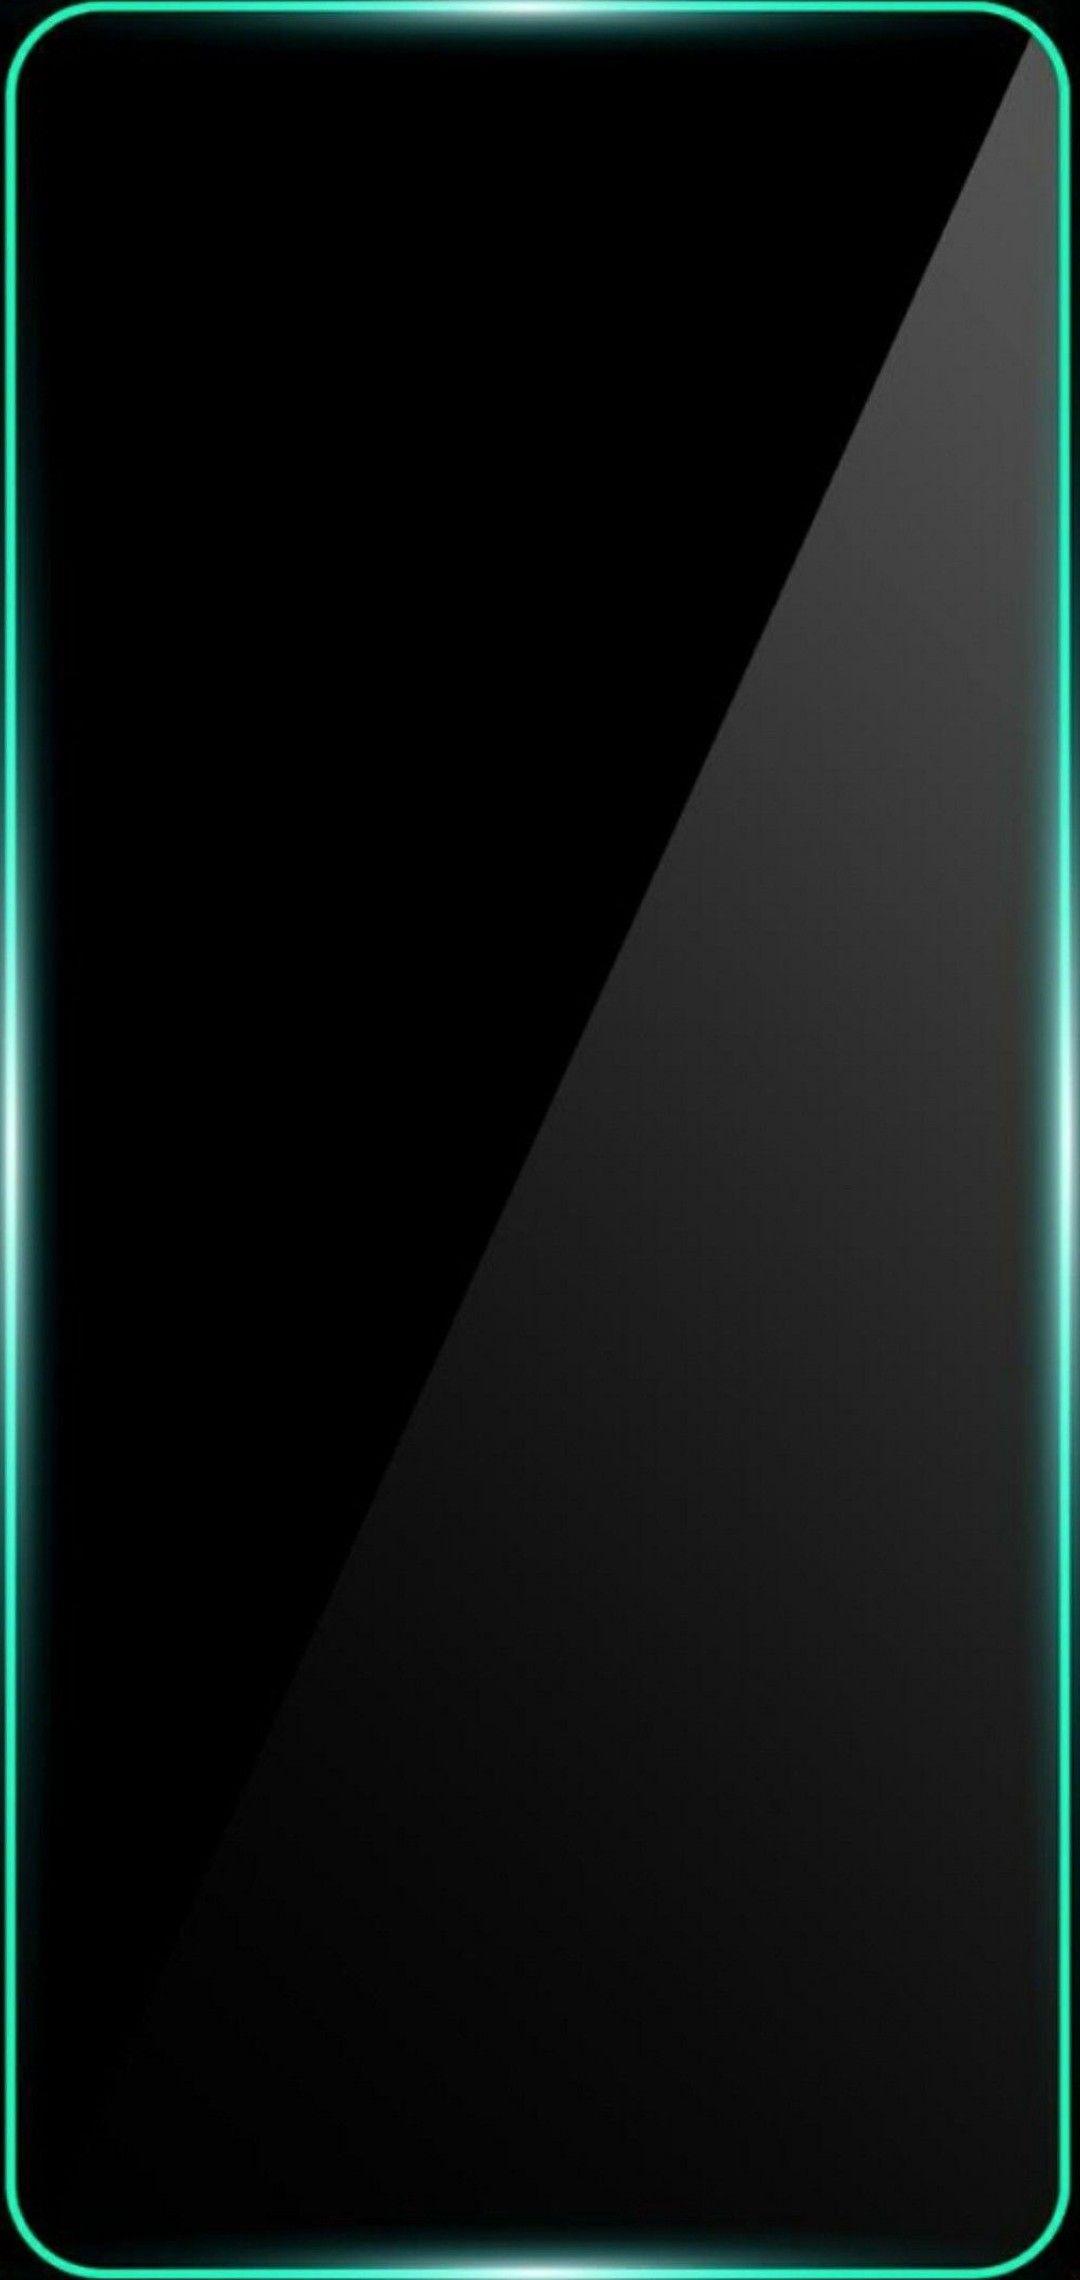 Green And Black Border Line 1080x2280 Galaxy Phone Wallpaper Backgrounds Phone Wallpapers Black Wallpaper